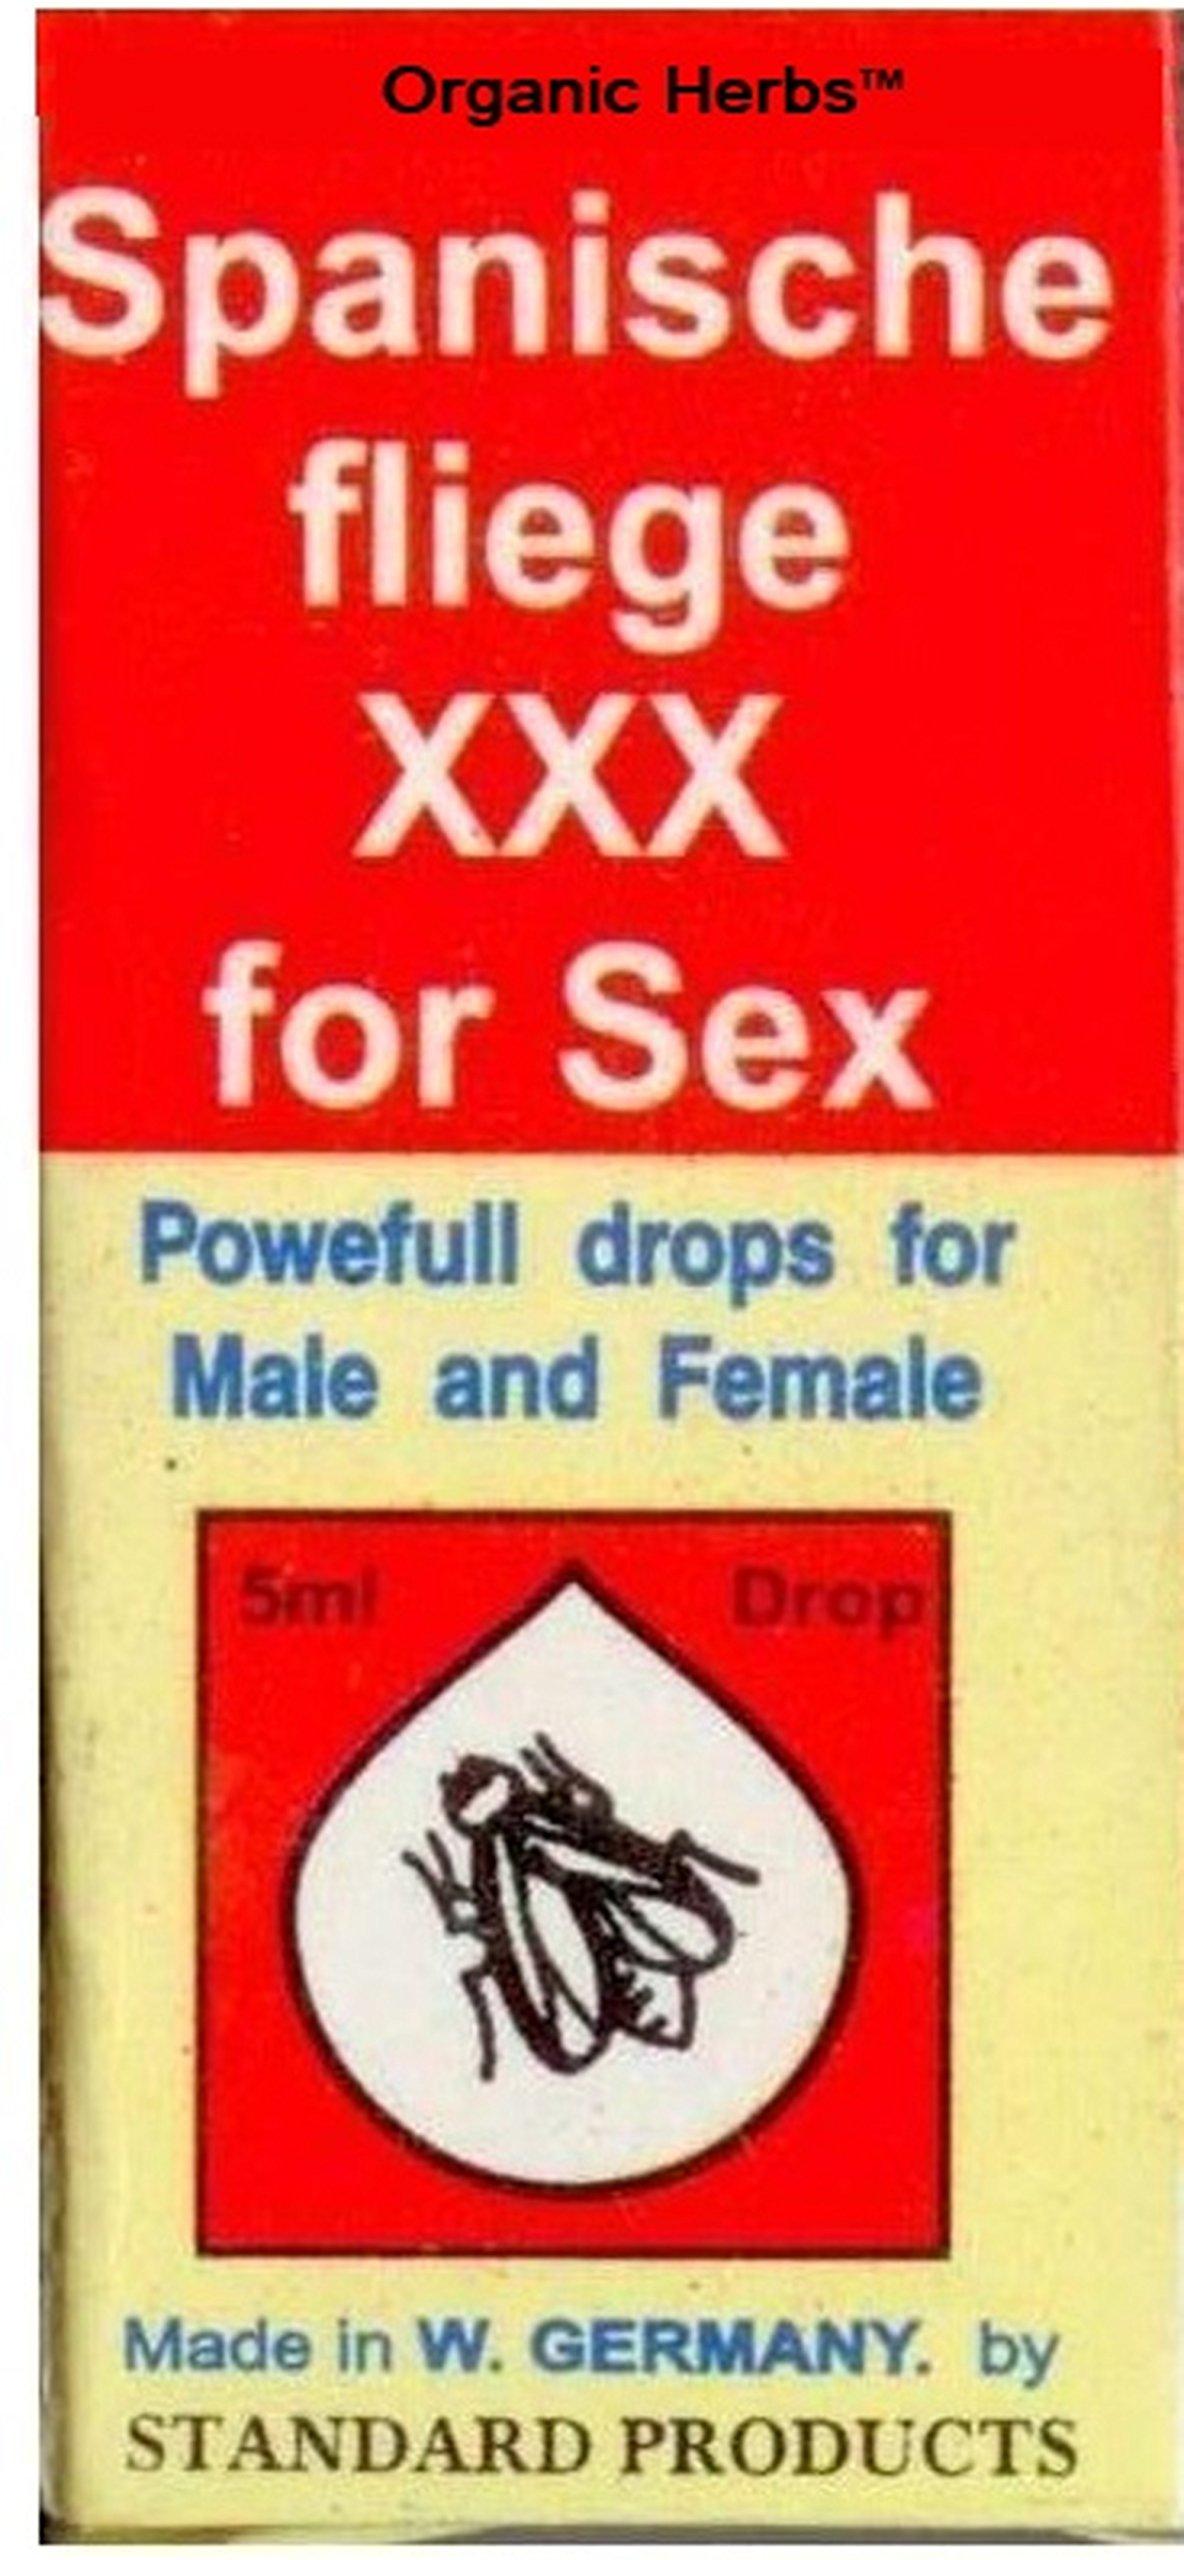 100 pc Of Original Inverma Spanish FLY Spanische Fliege Girl Strong SEX Drop Aphrodisiac Libido 5ml by Organic Herb's